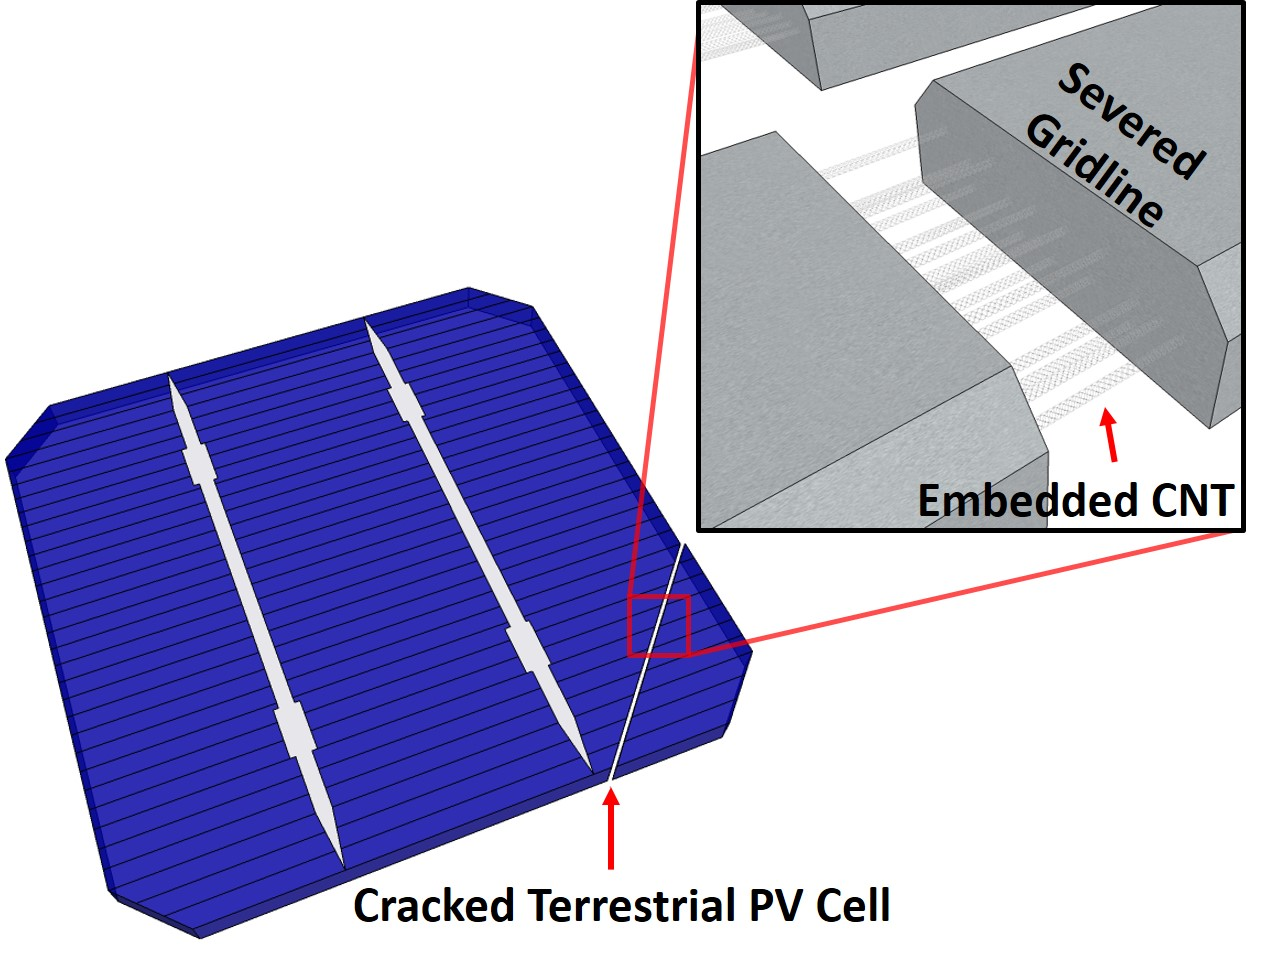 https://secureservercdn.net/192.169.220.223/49d.828.myftpupload.com/wp-content/uploads/2018/11/Cracked-Terrestrial-PV-Cell.jpg